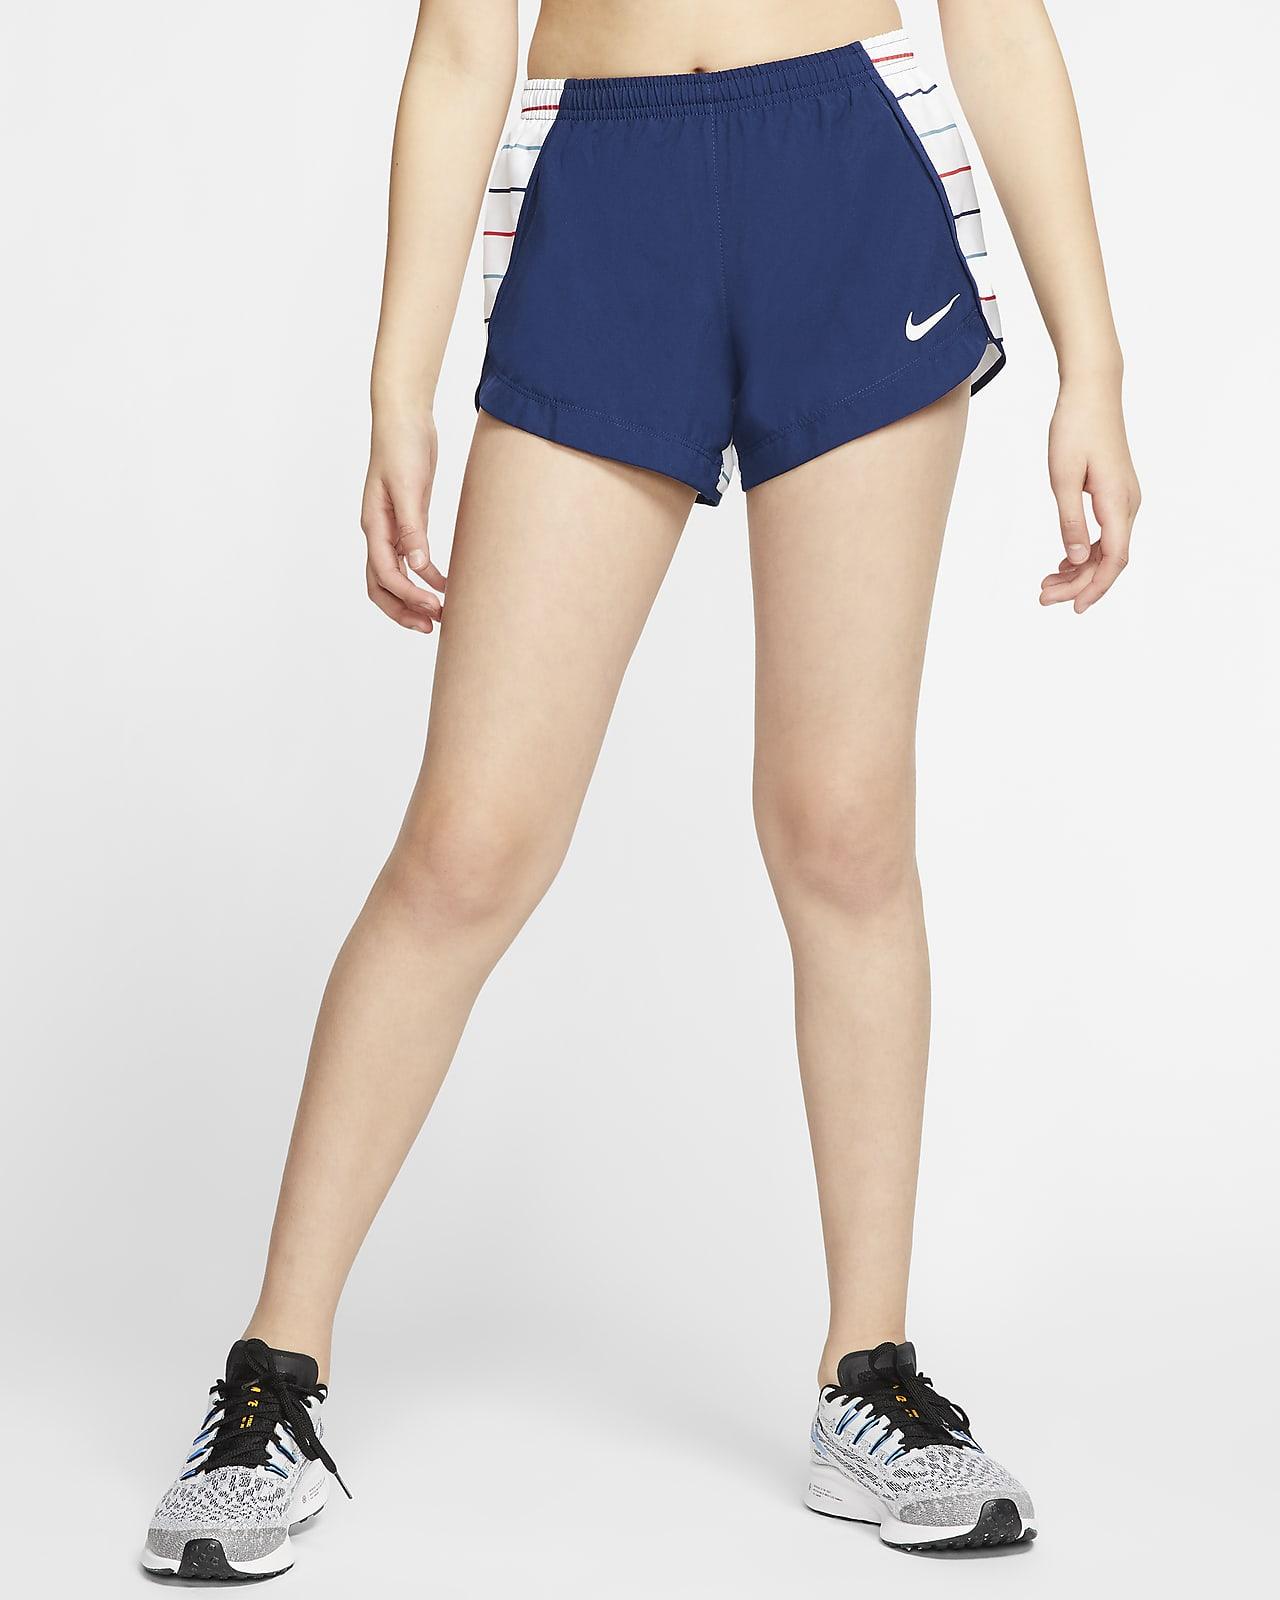 Nike Big Kids' (Girls') Running Shorts